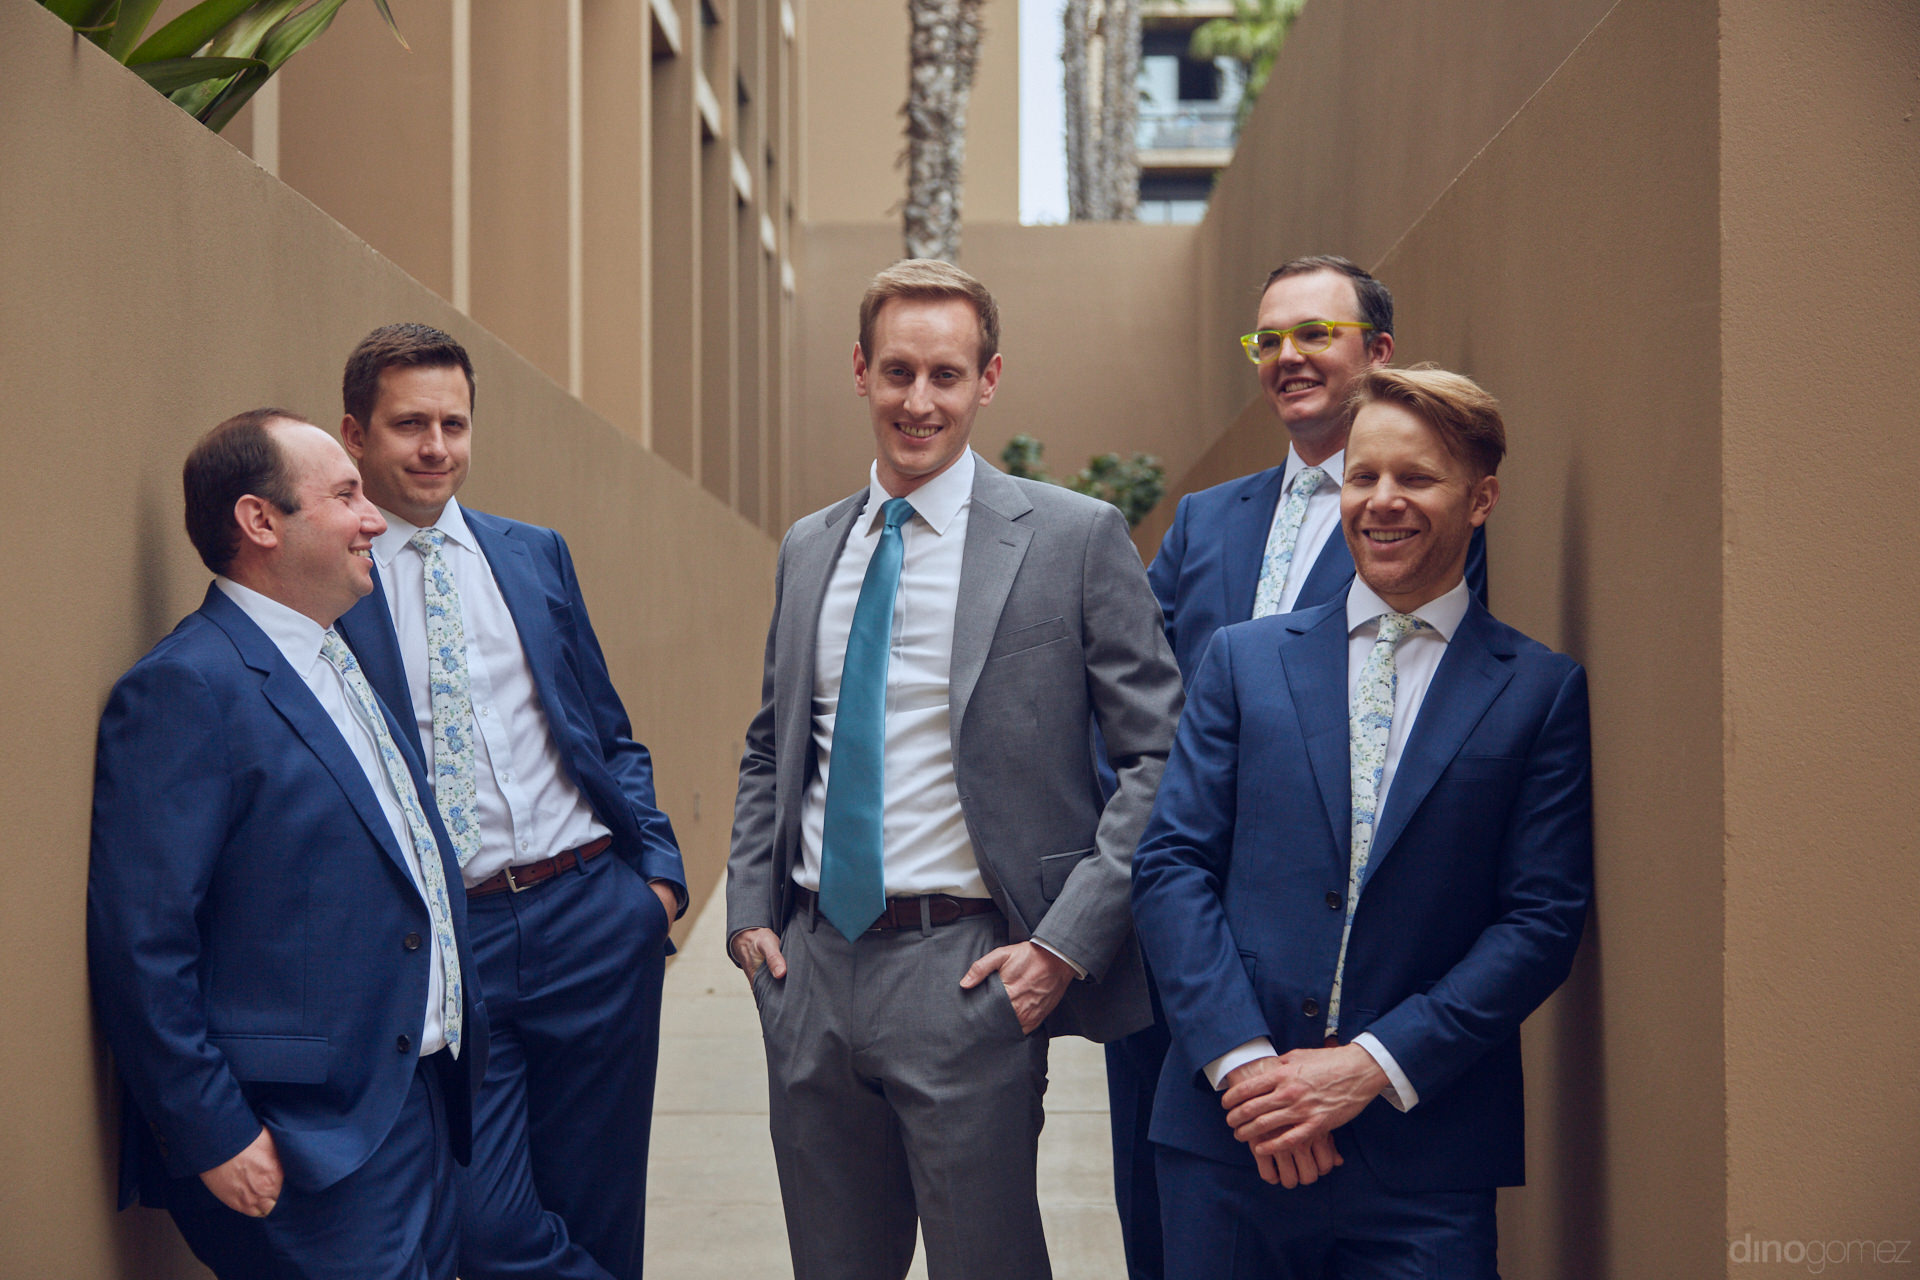 Cabo Wedding Fashion For Gentlemen - Hilary & Bryan Flora Wedding